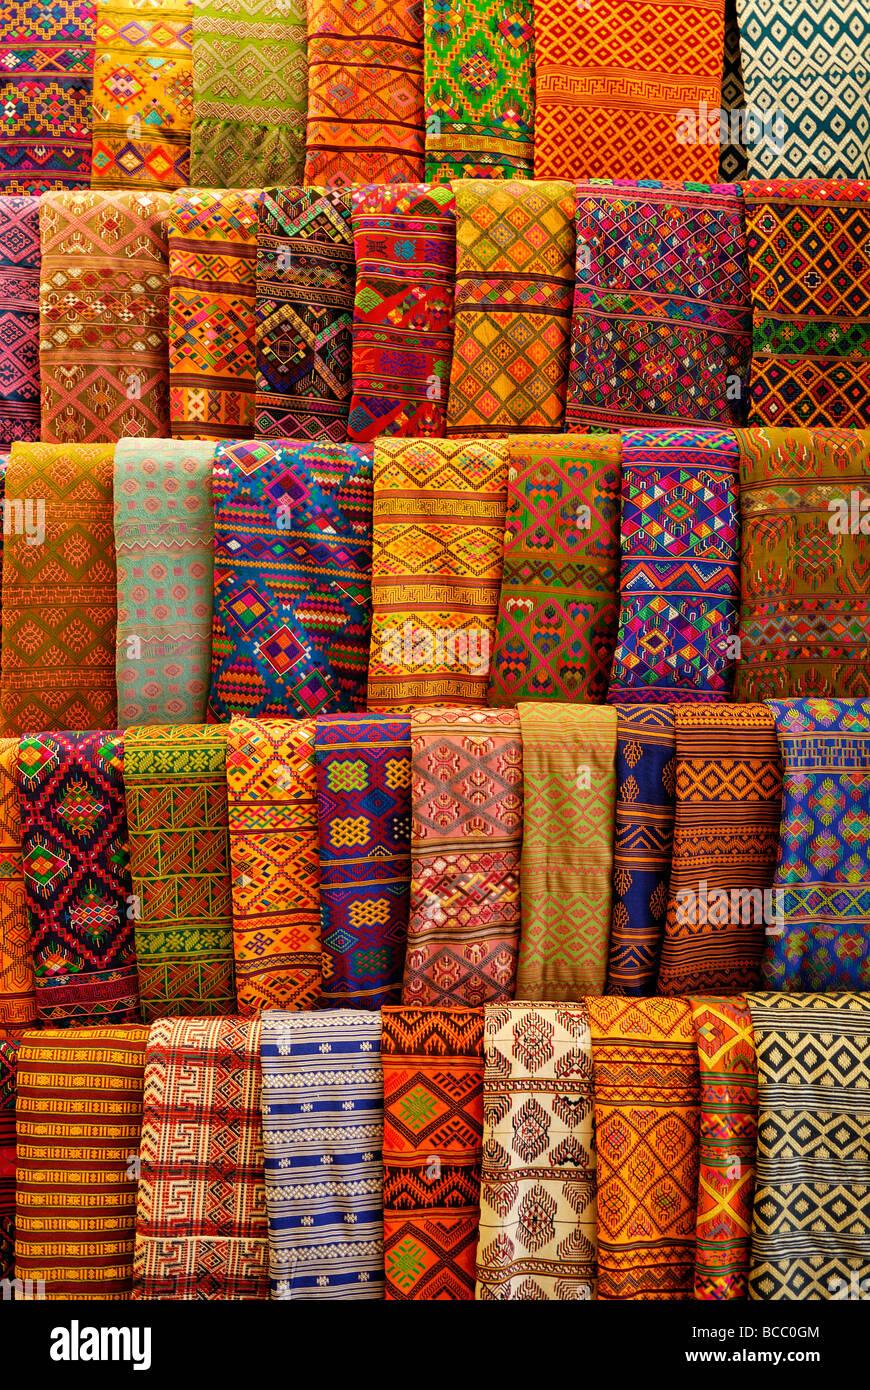 Bhutan, Thimphu, handicrafts emporium, traditional Bhutanese textiles - Stock Image